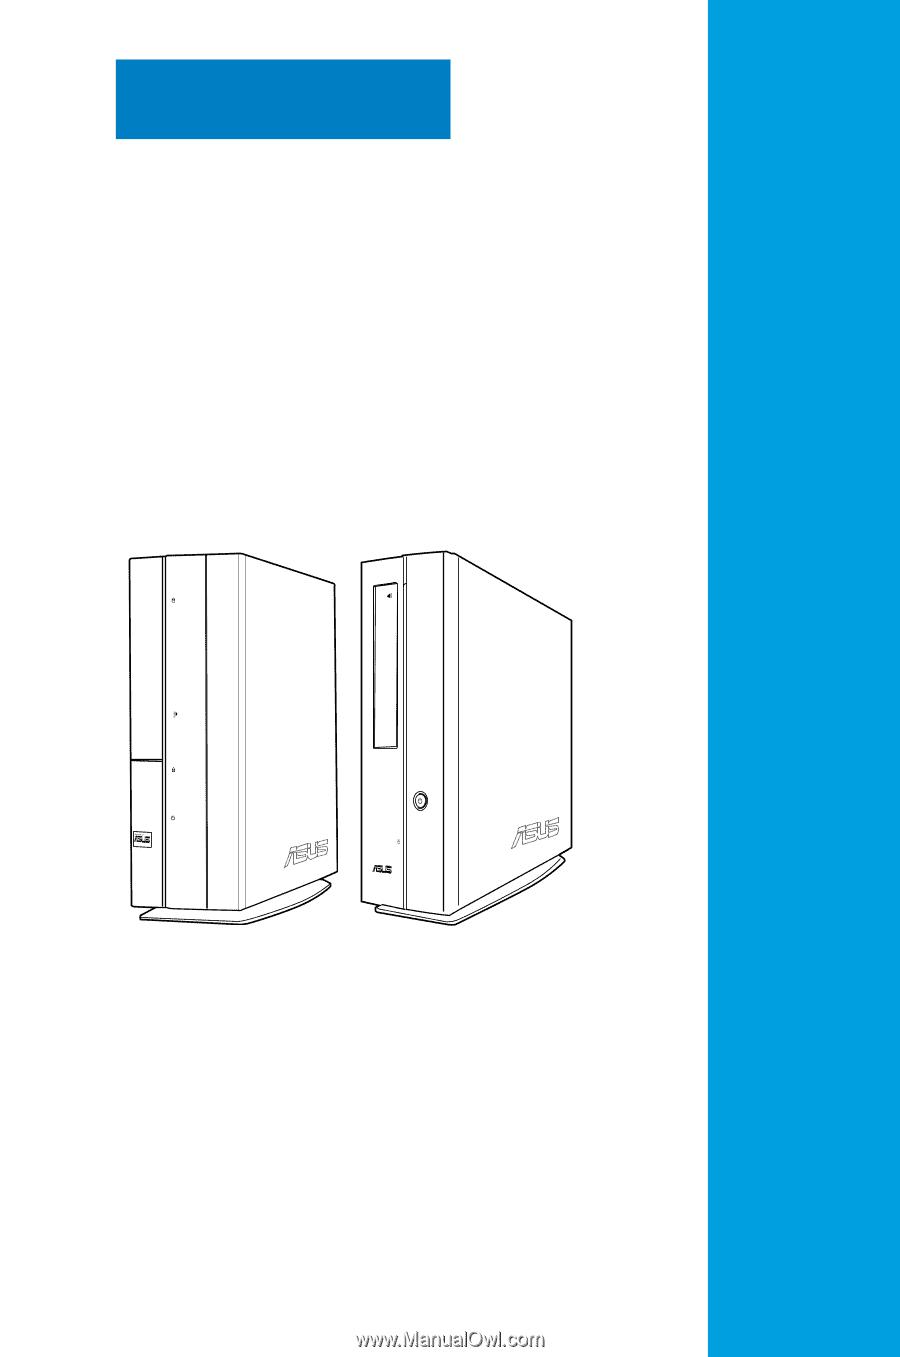 Asus P2-M3A3200 ALC1200 Audio Windows Vista 32-BIT